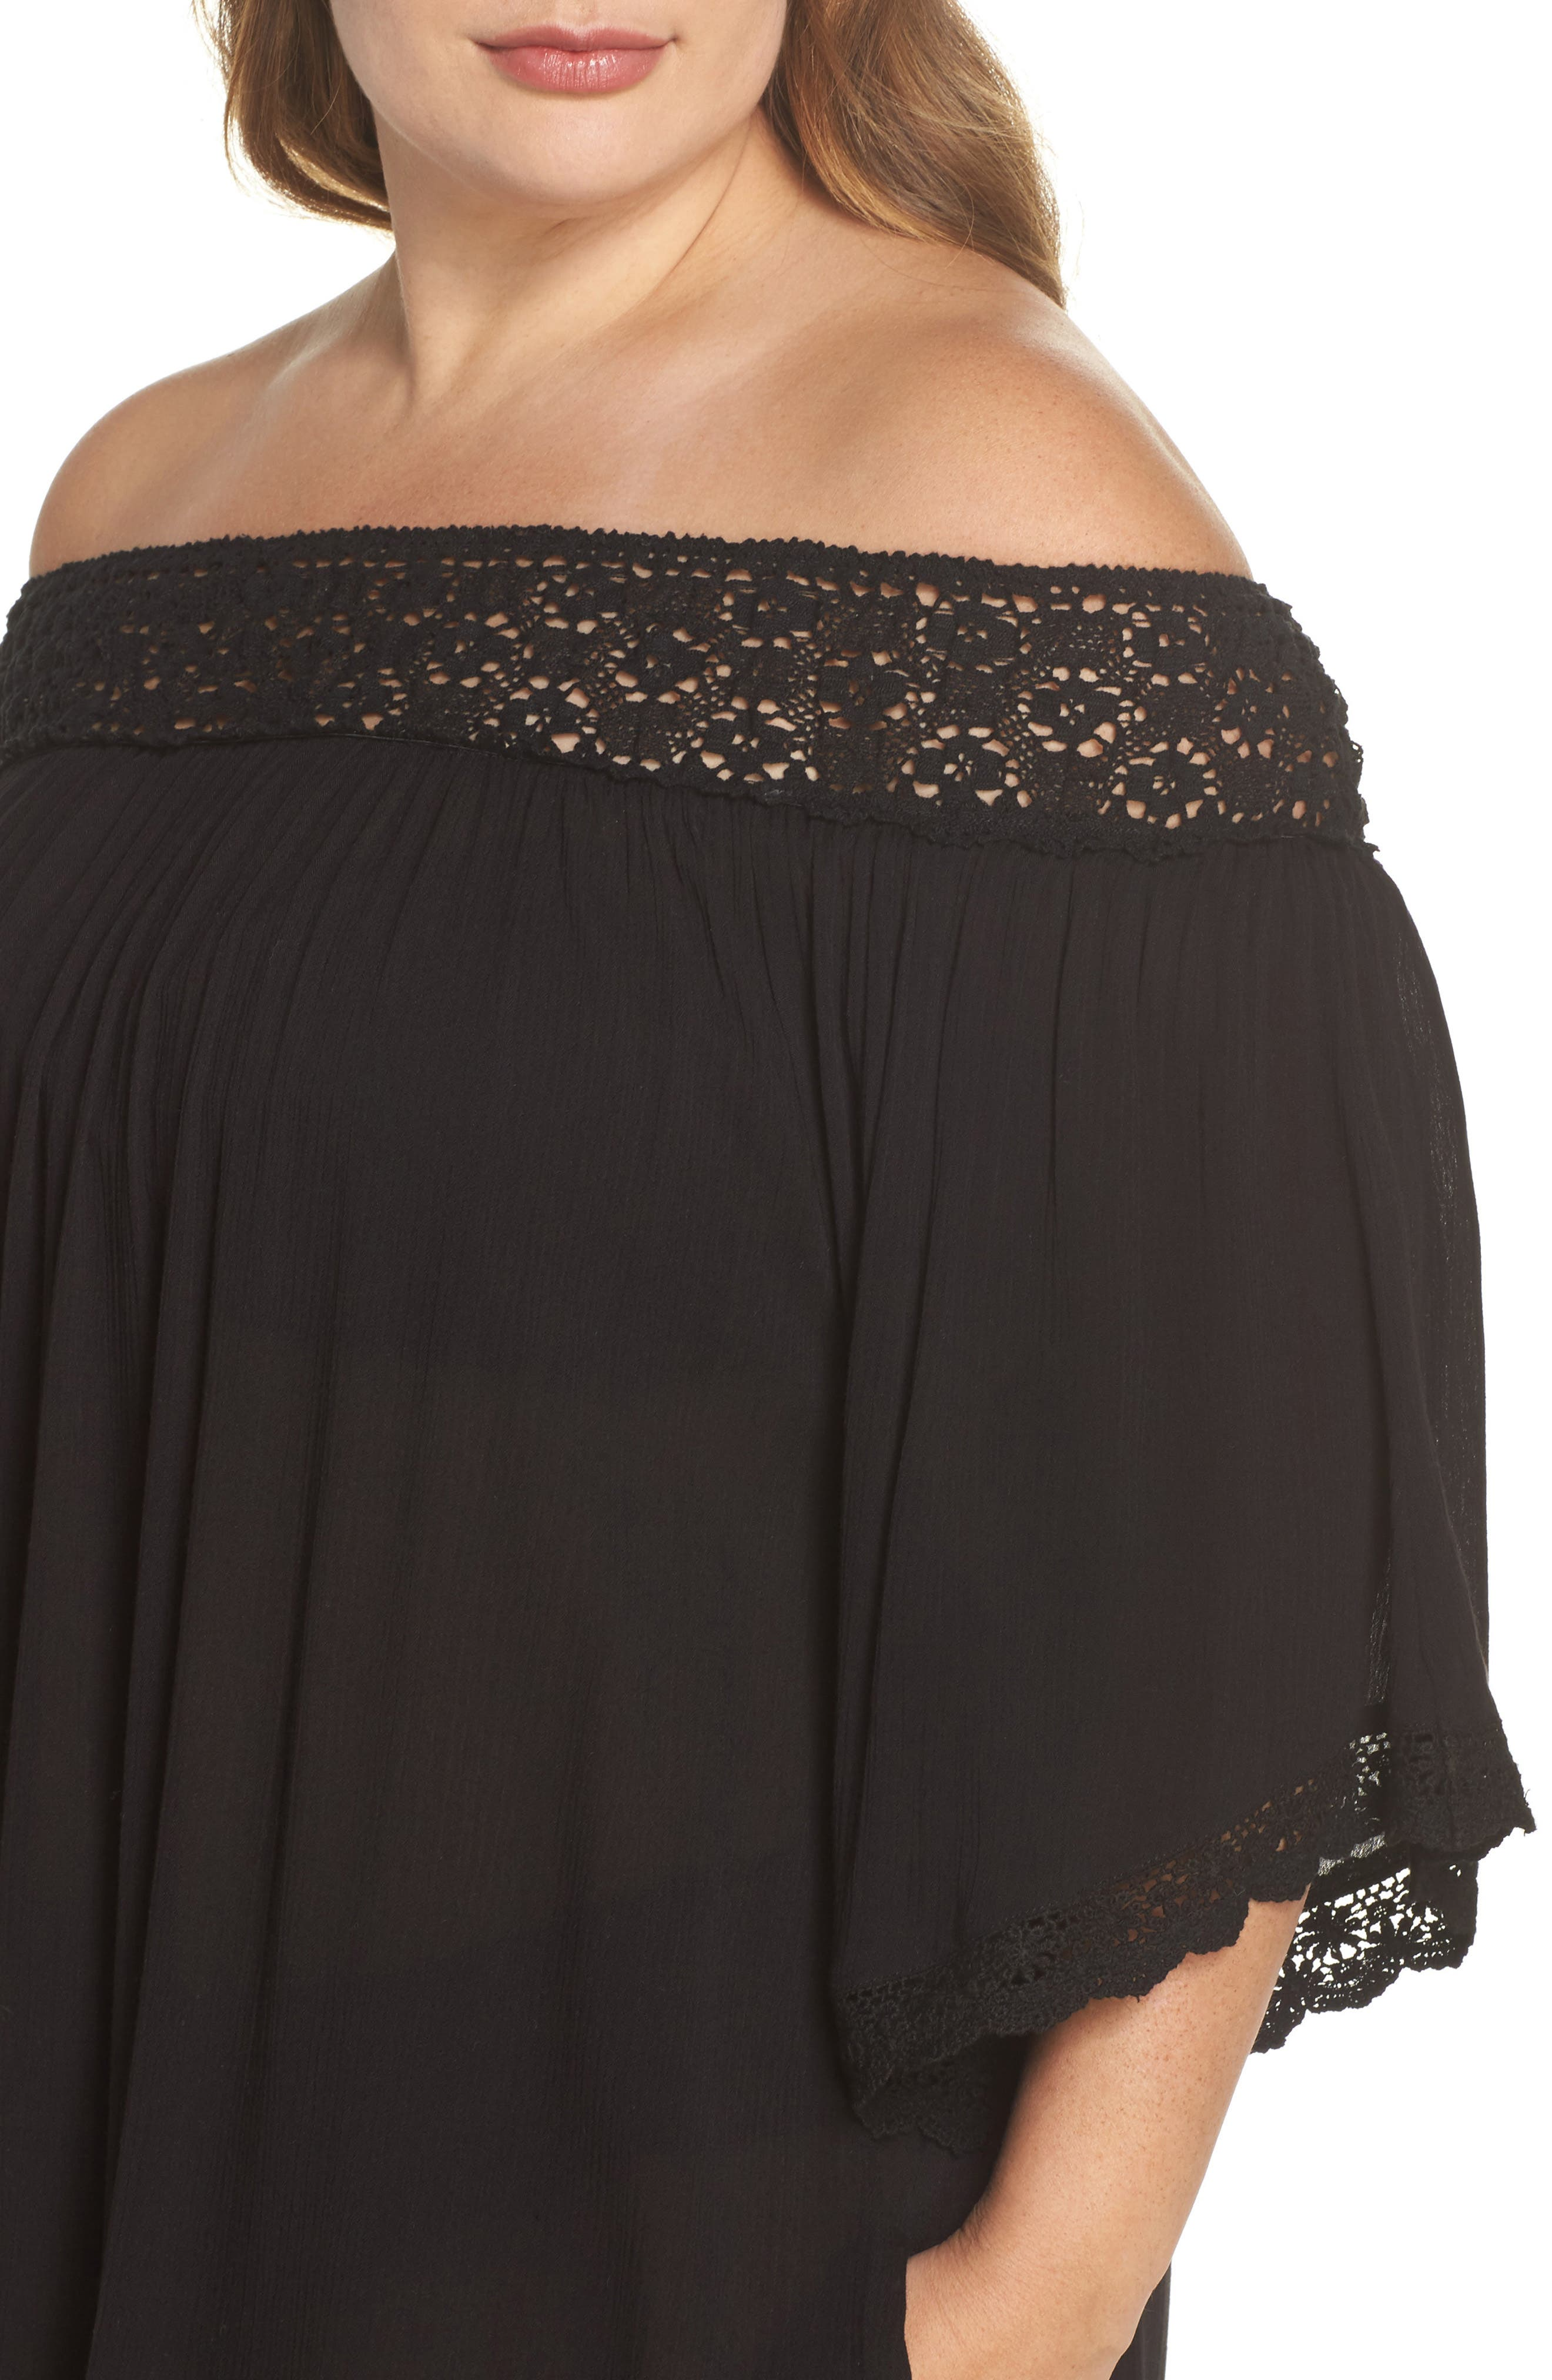 Rimini Crochet Cover-Up Dress,                             Alternate thumbnail 4, color,                             001